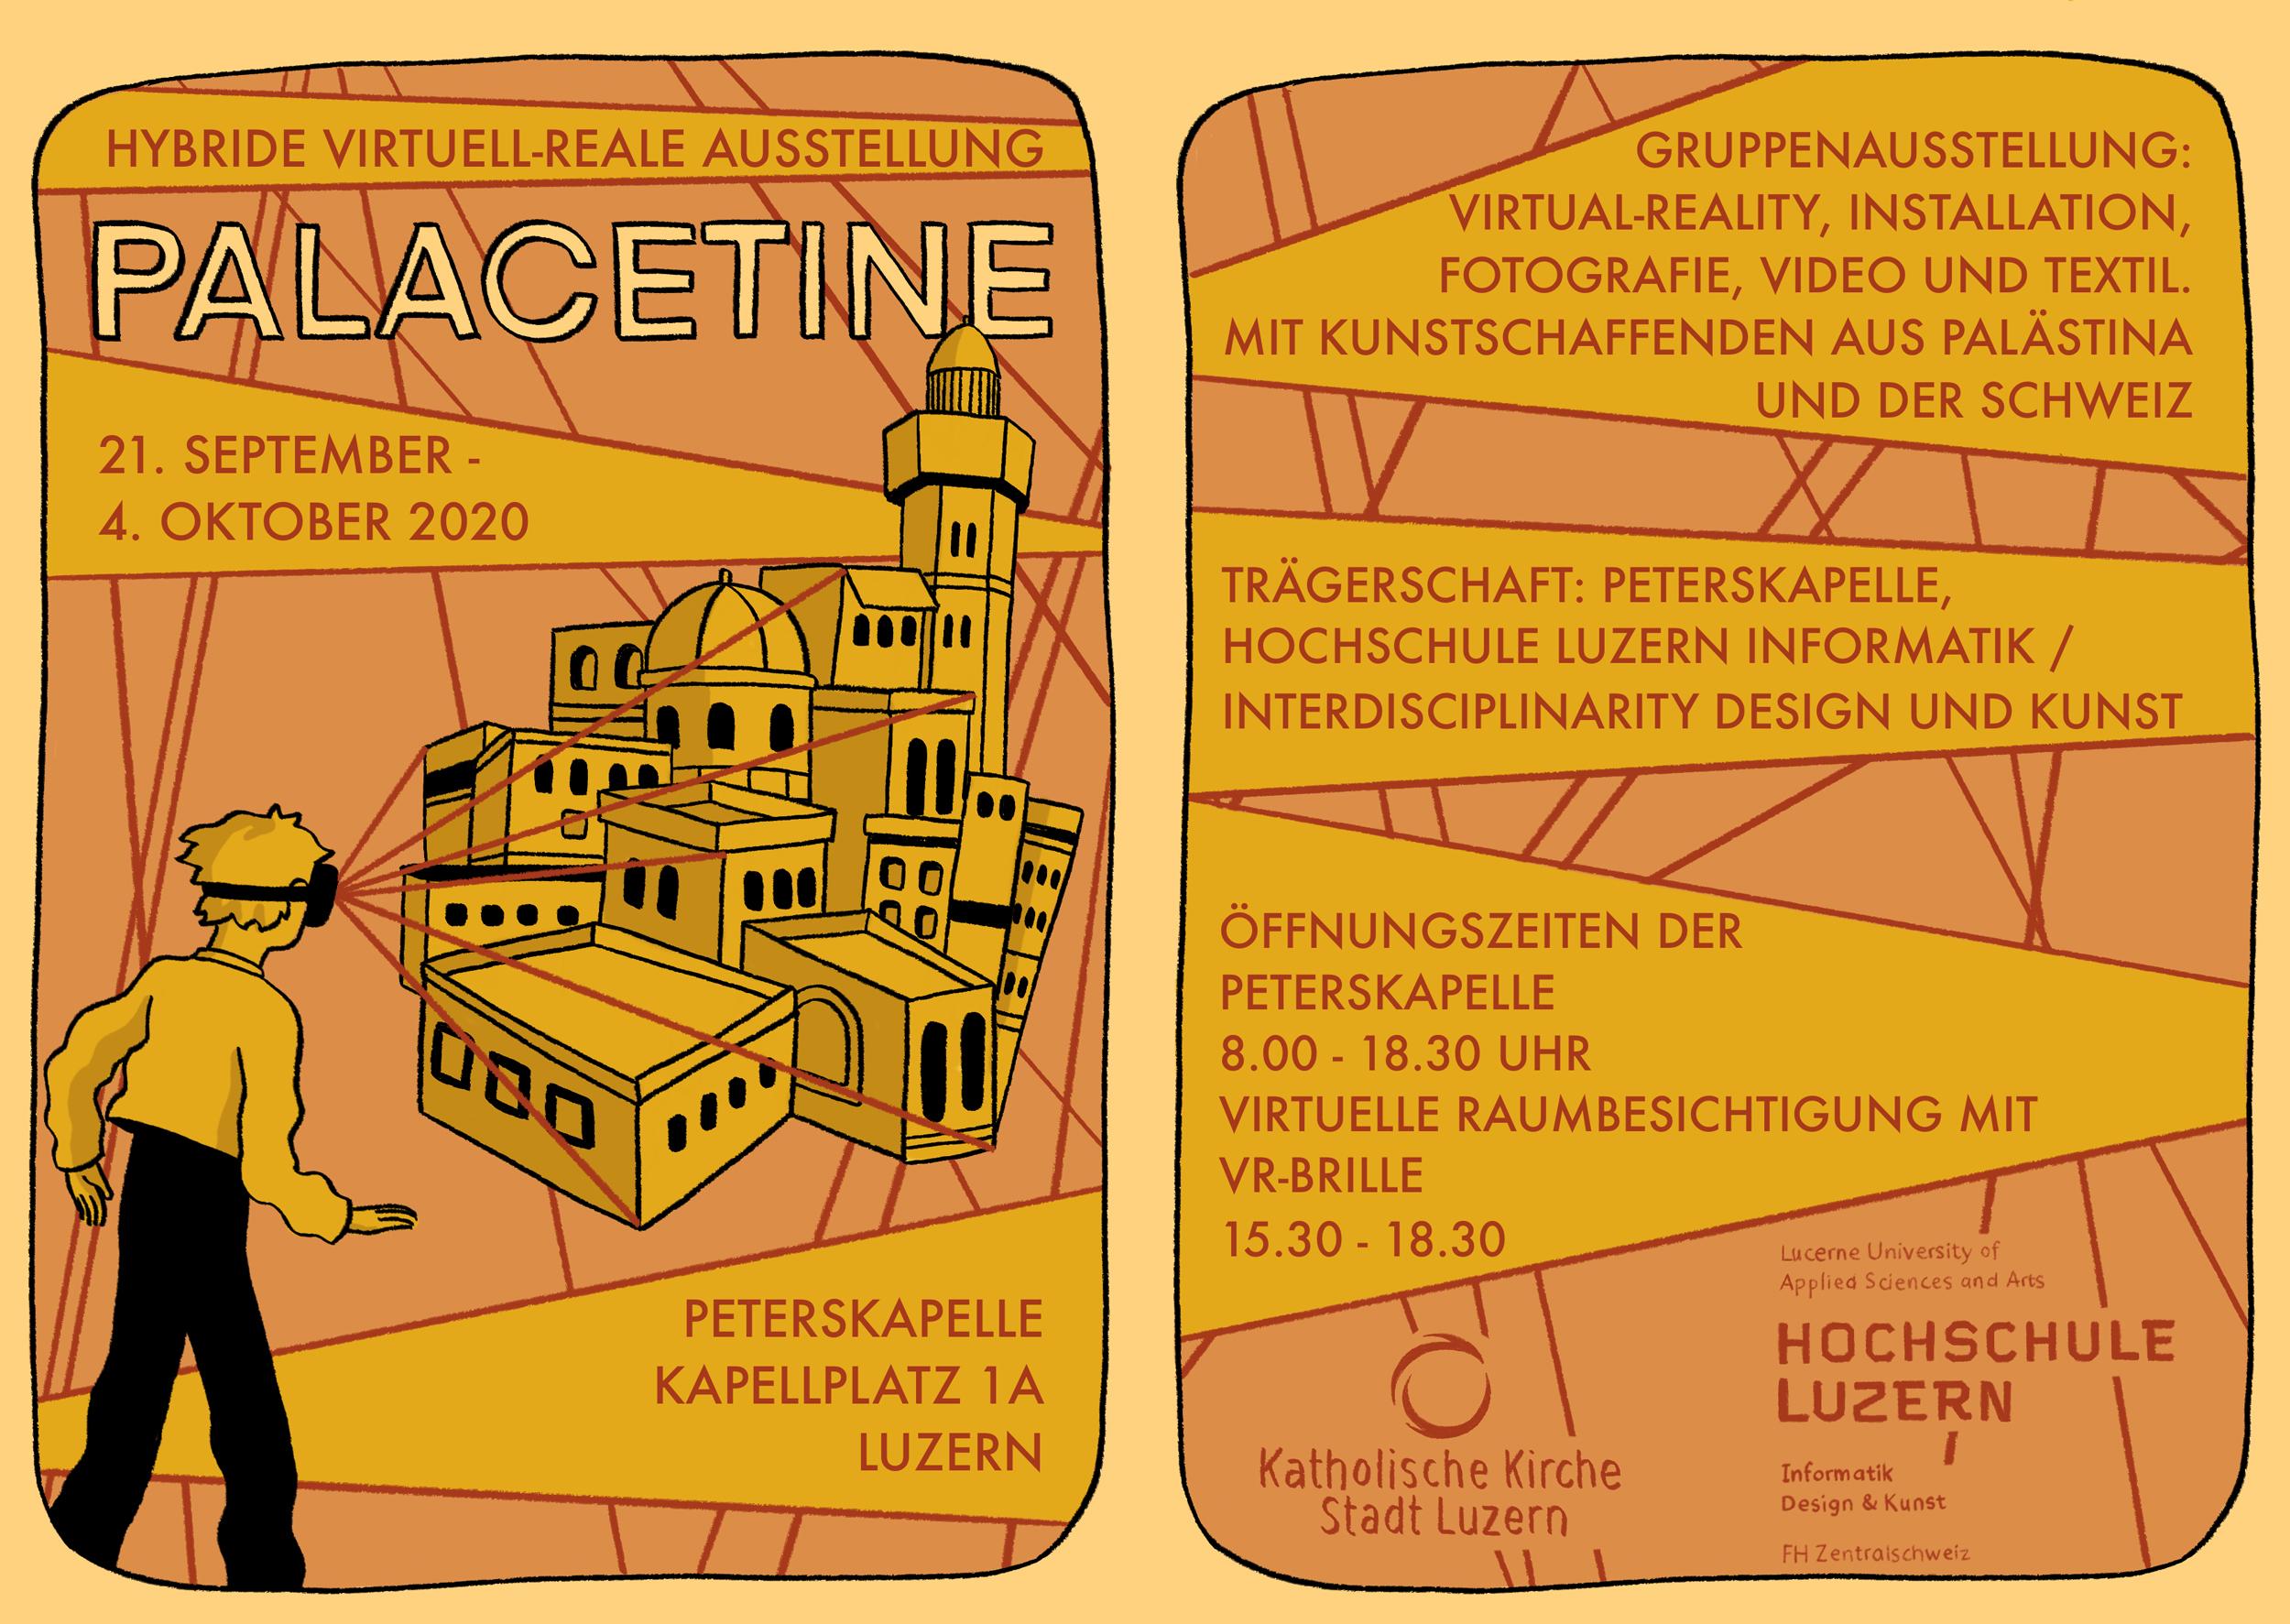 Palacetine